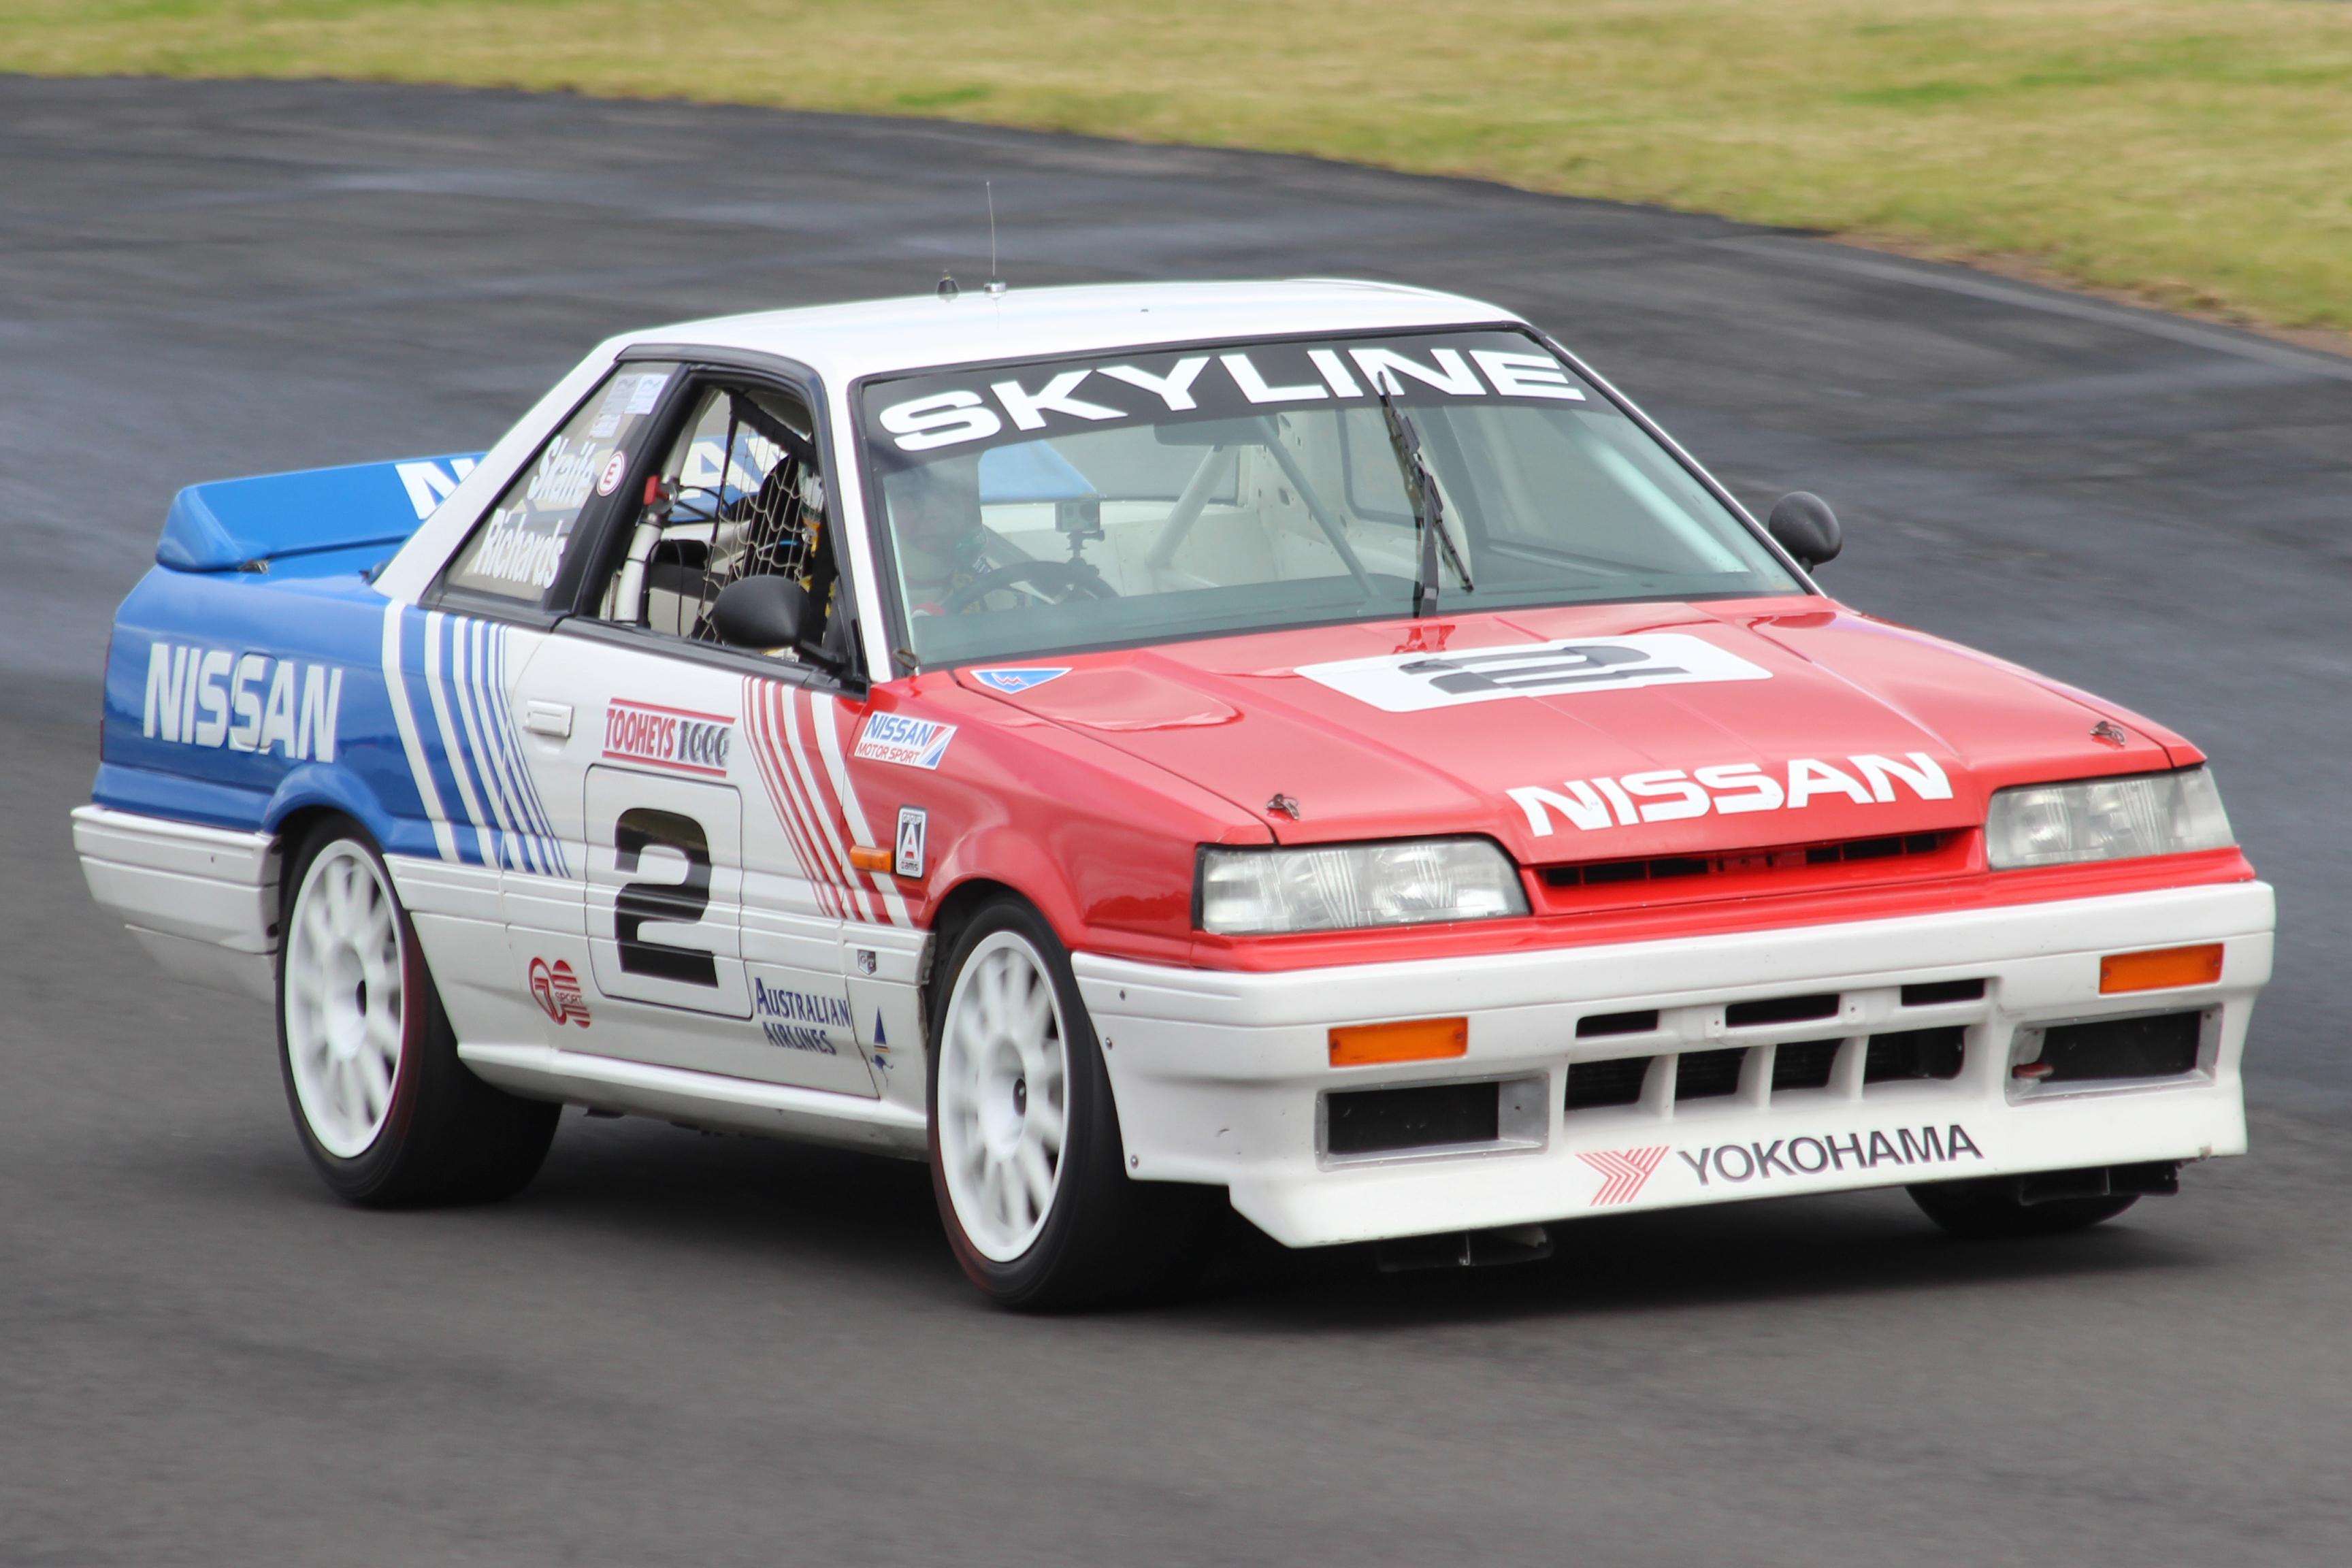 Nissan Skyline Racing Cars For Sale